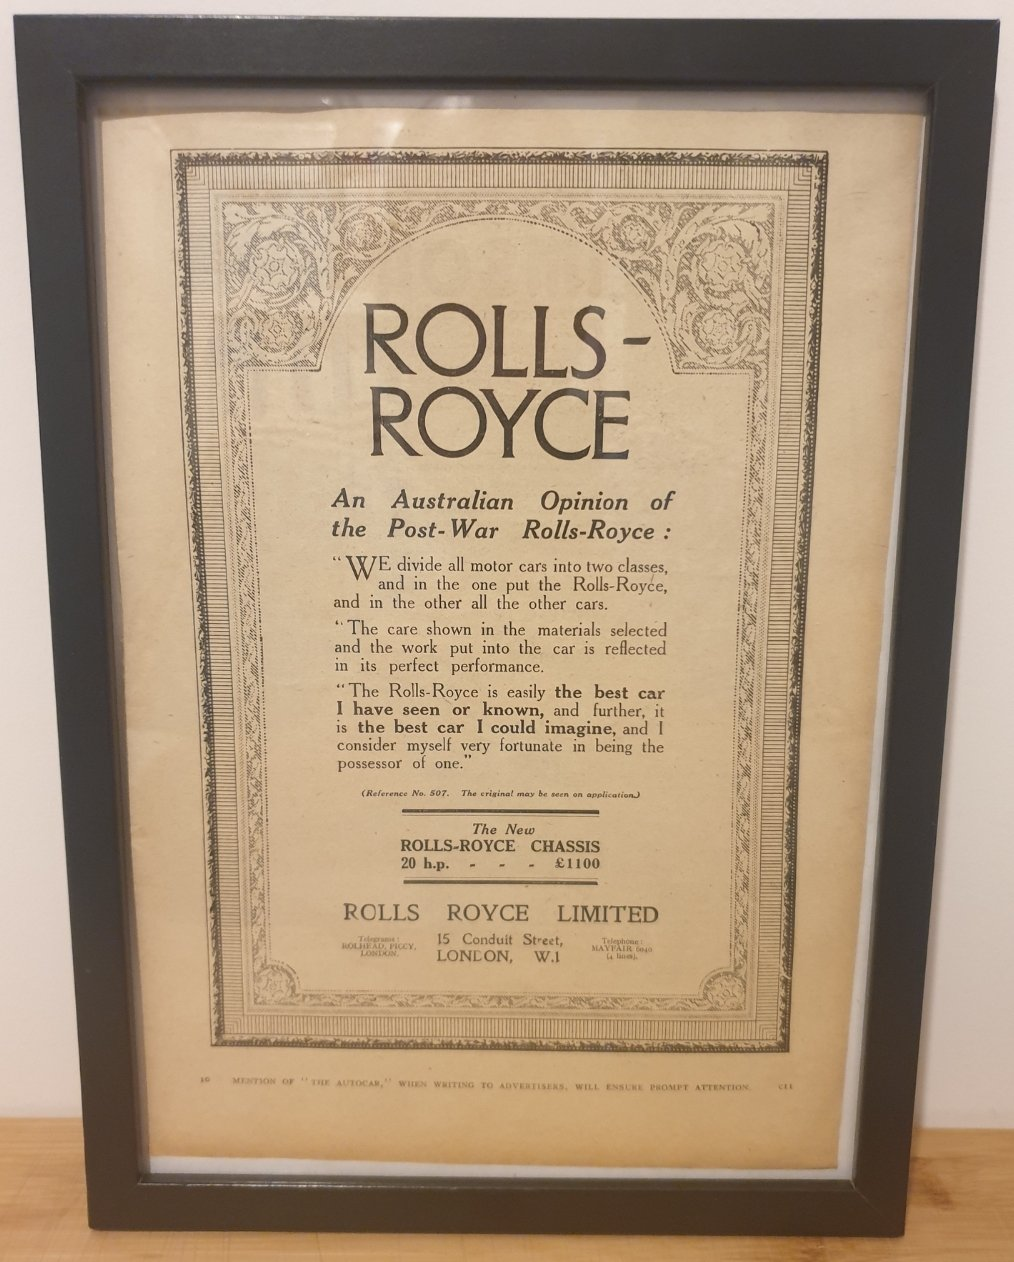 1989 Original 1922 Rolls-Royce Framed Advert  For Sale (picture 1 of 3)